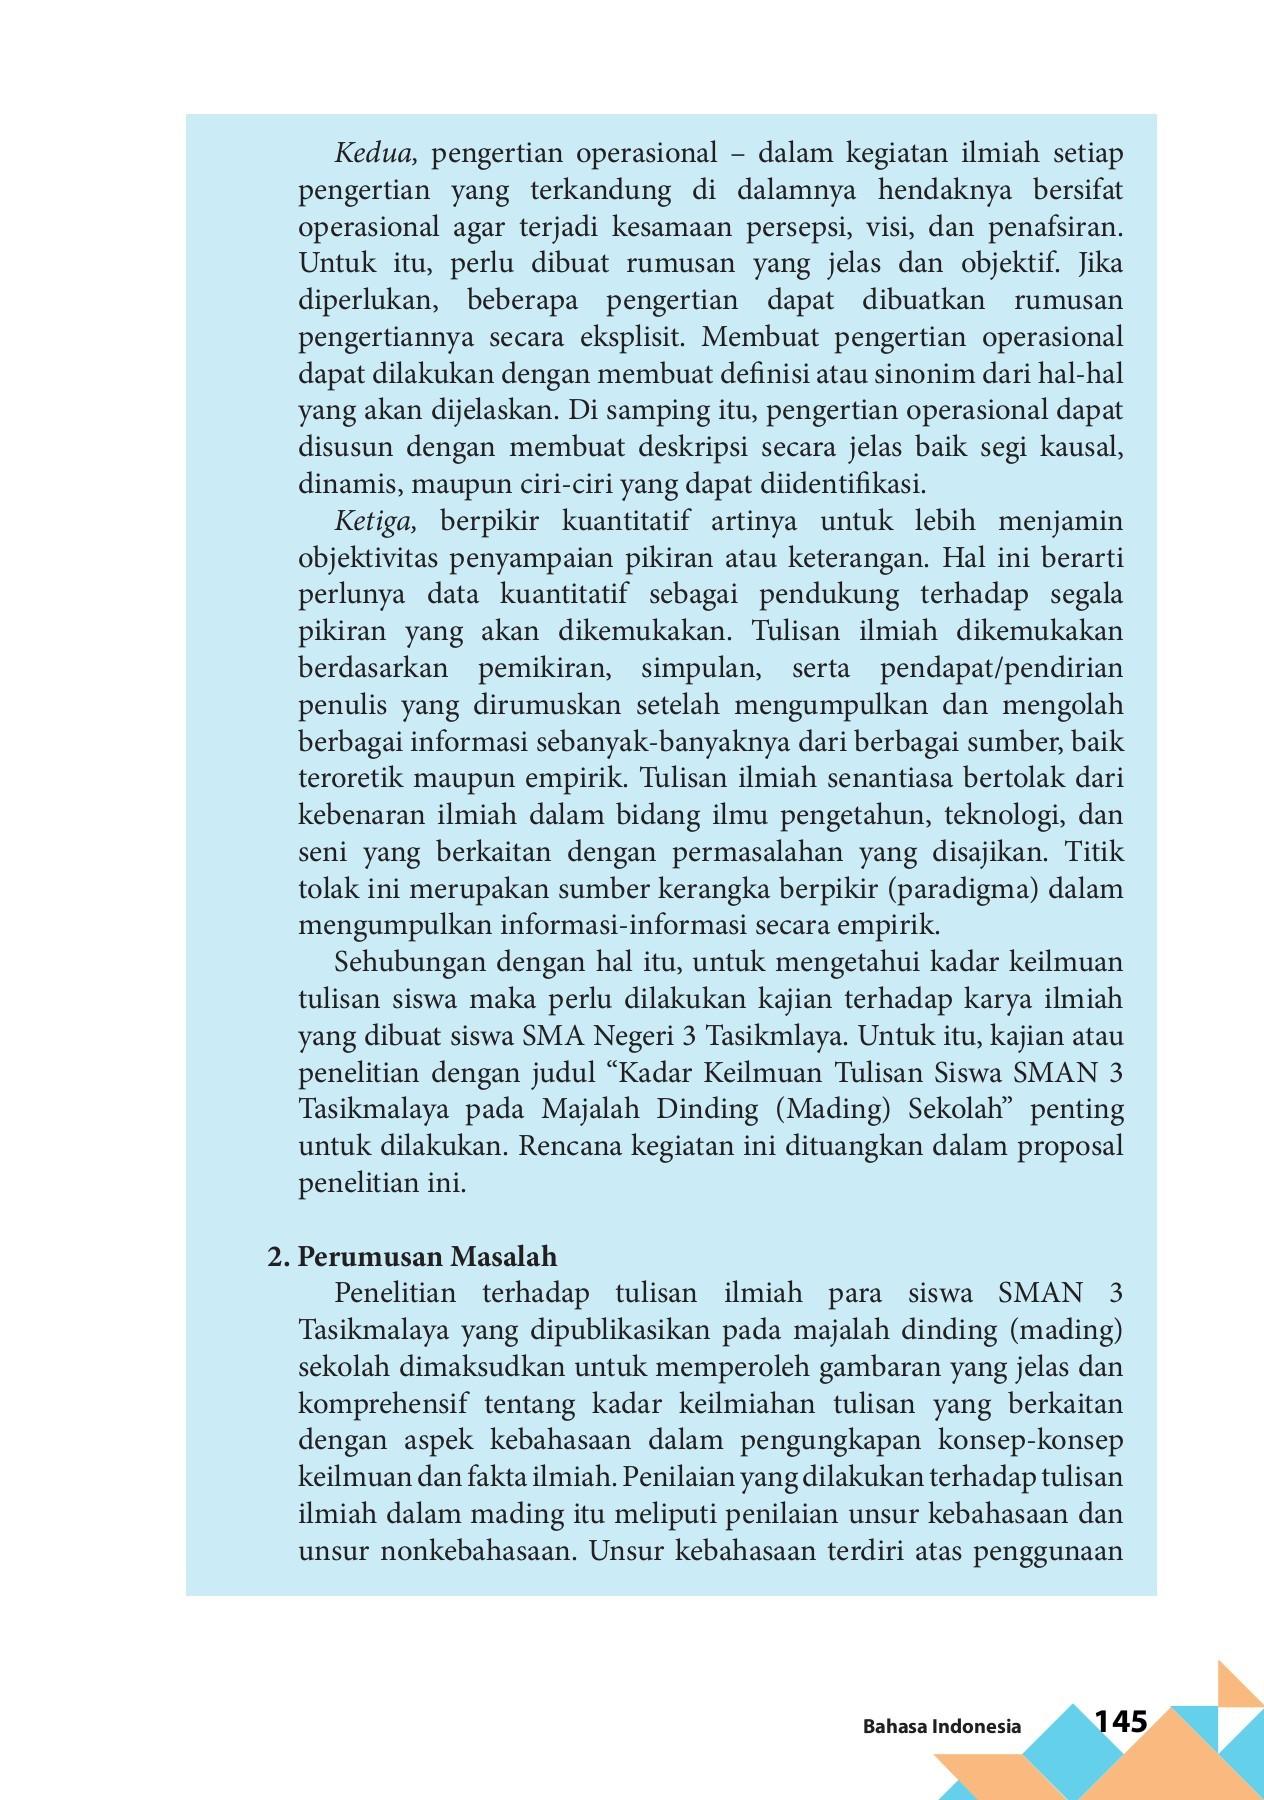 Bahasa Indonesia Kelas 11 By Sartono Flip Book Pages 151 200 Pubhtml5